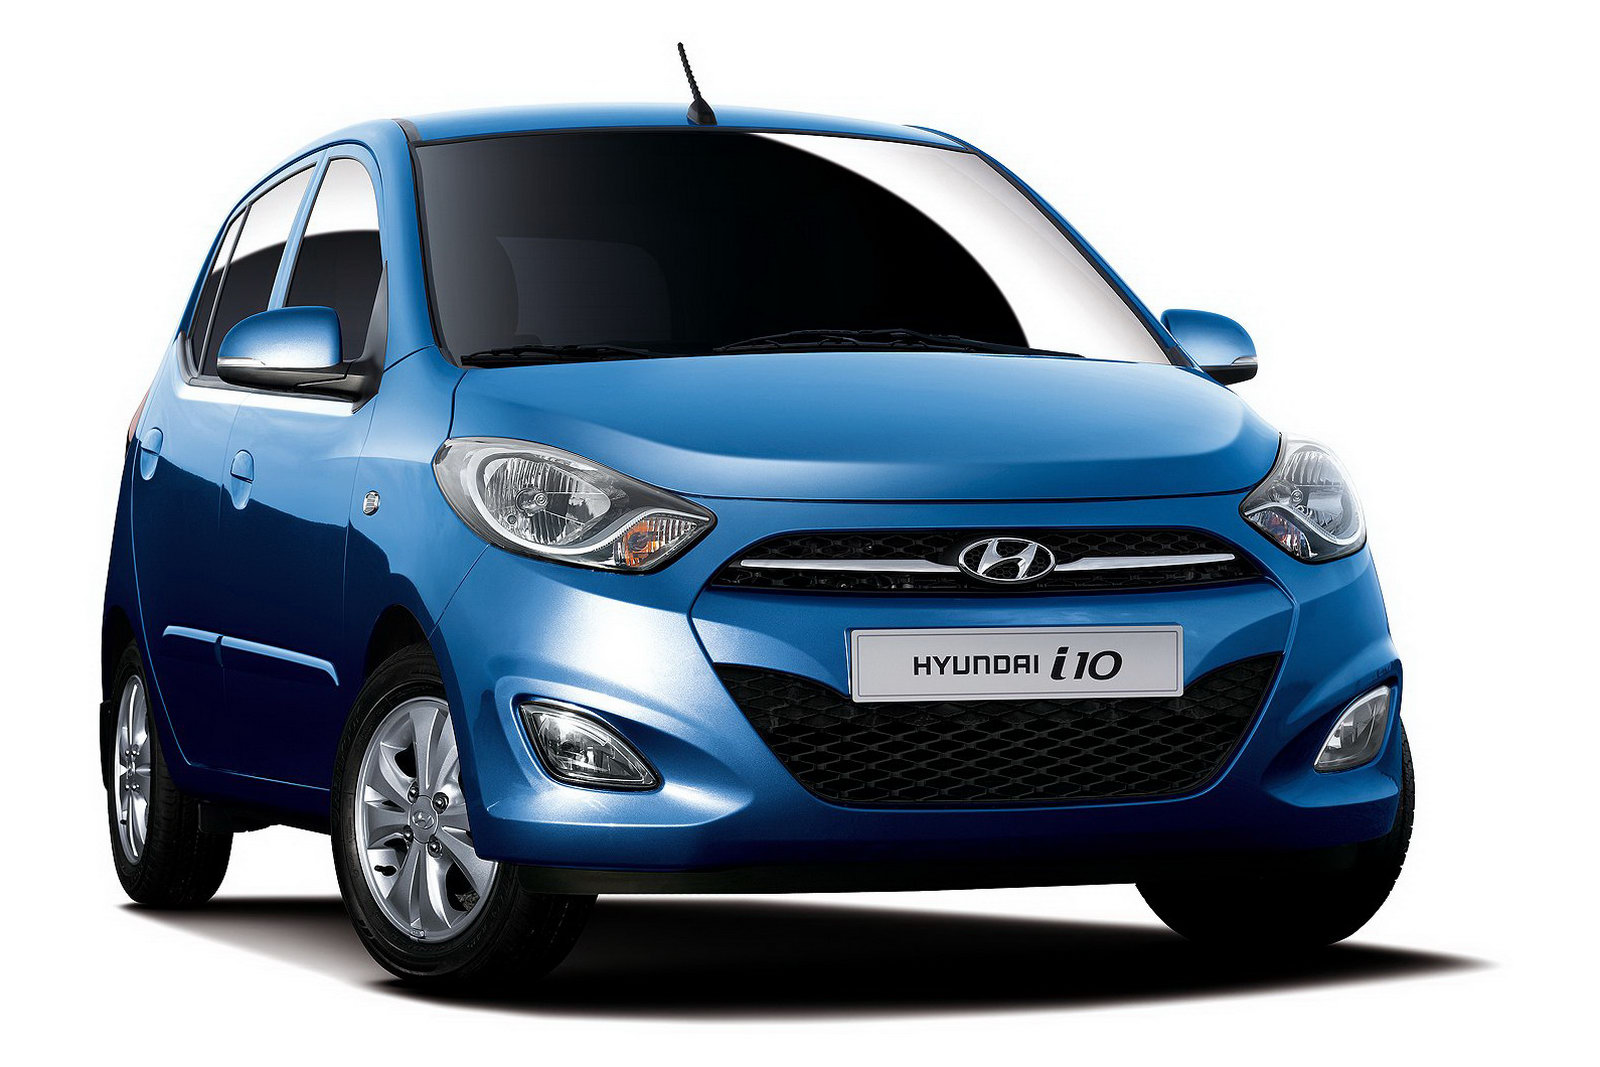 Hyundai i10 Not For Australia - 4-Star NCAP The Reason